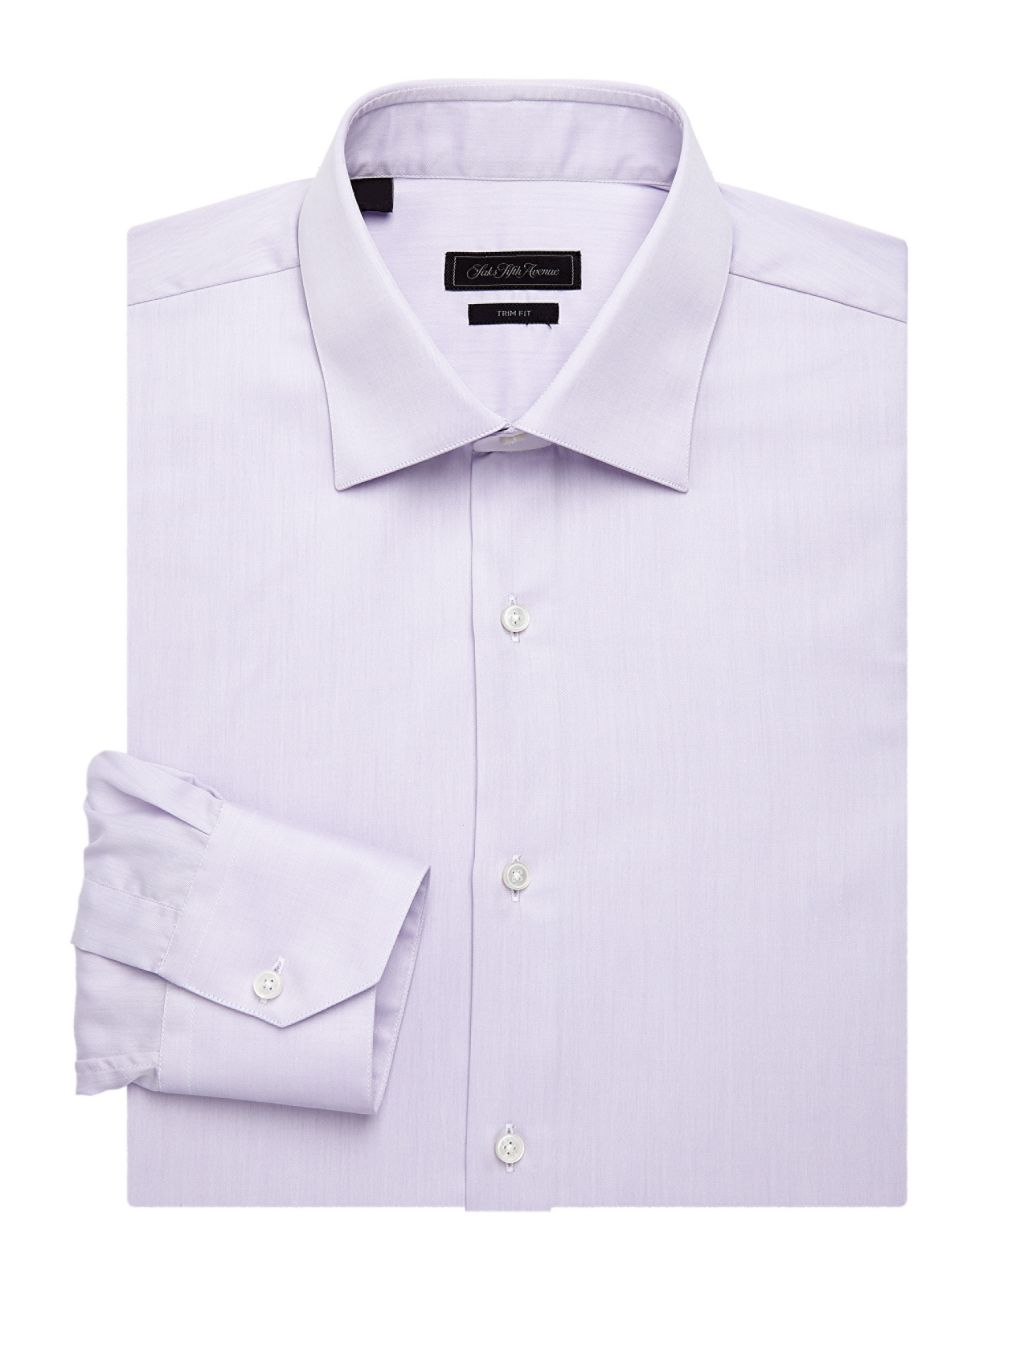 Saks Fifth Avenue COLLECTION Cotton Dress Shirt